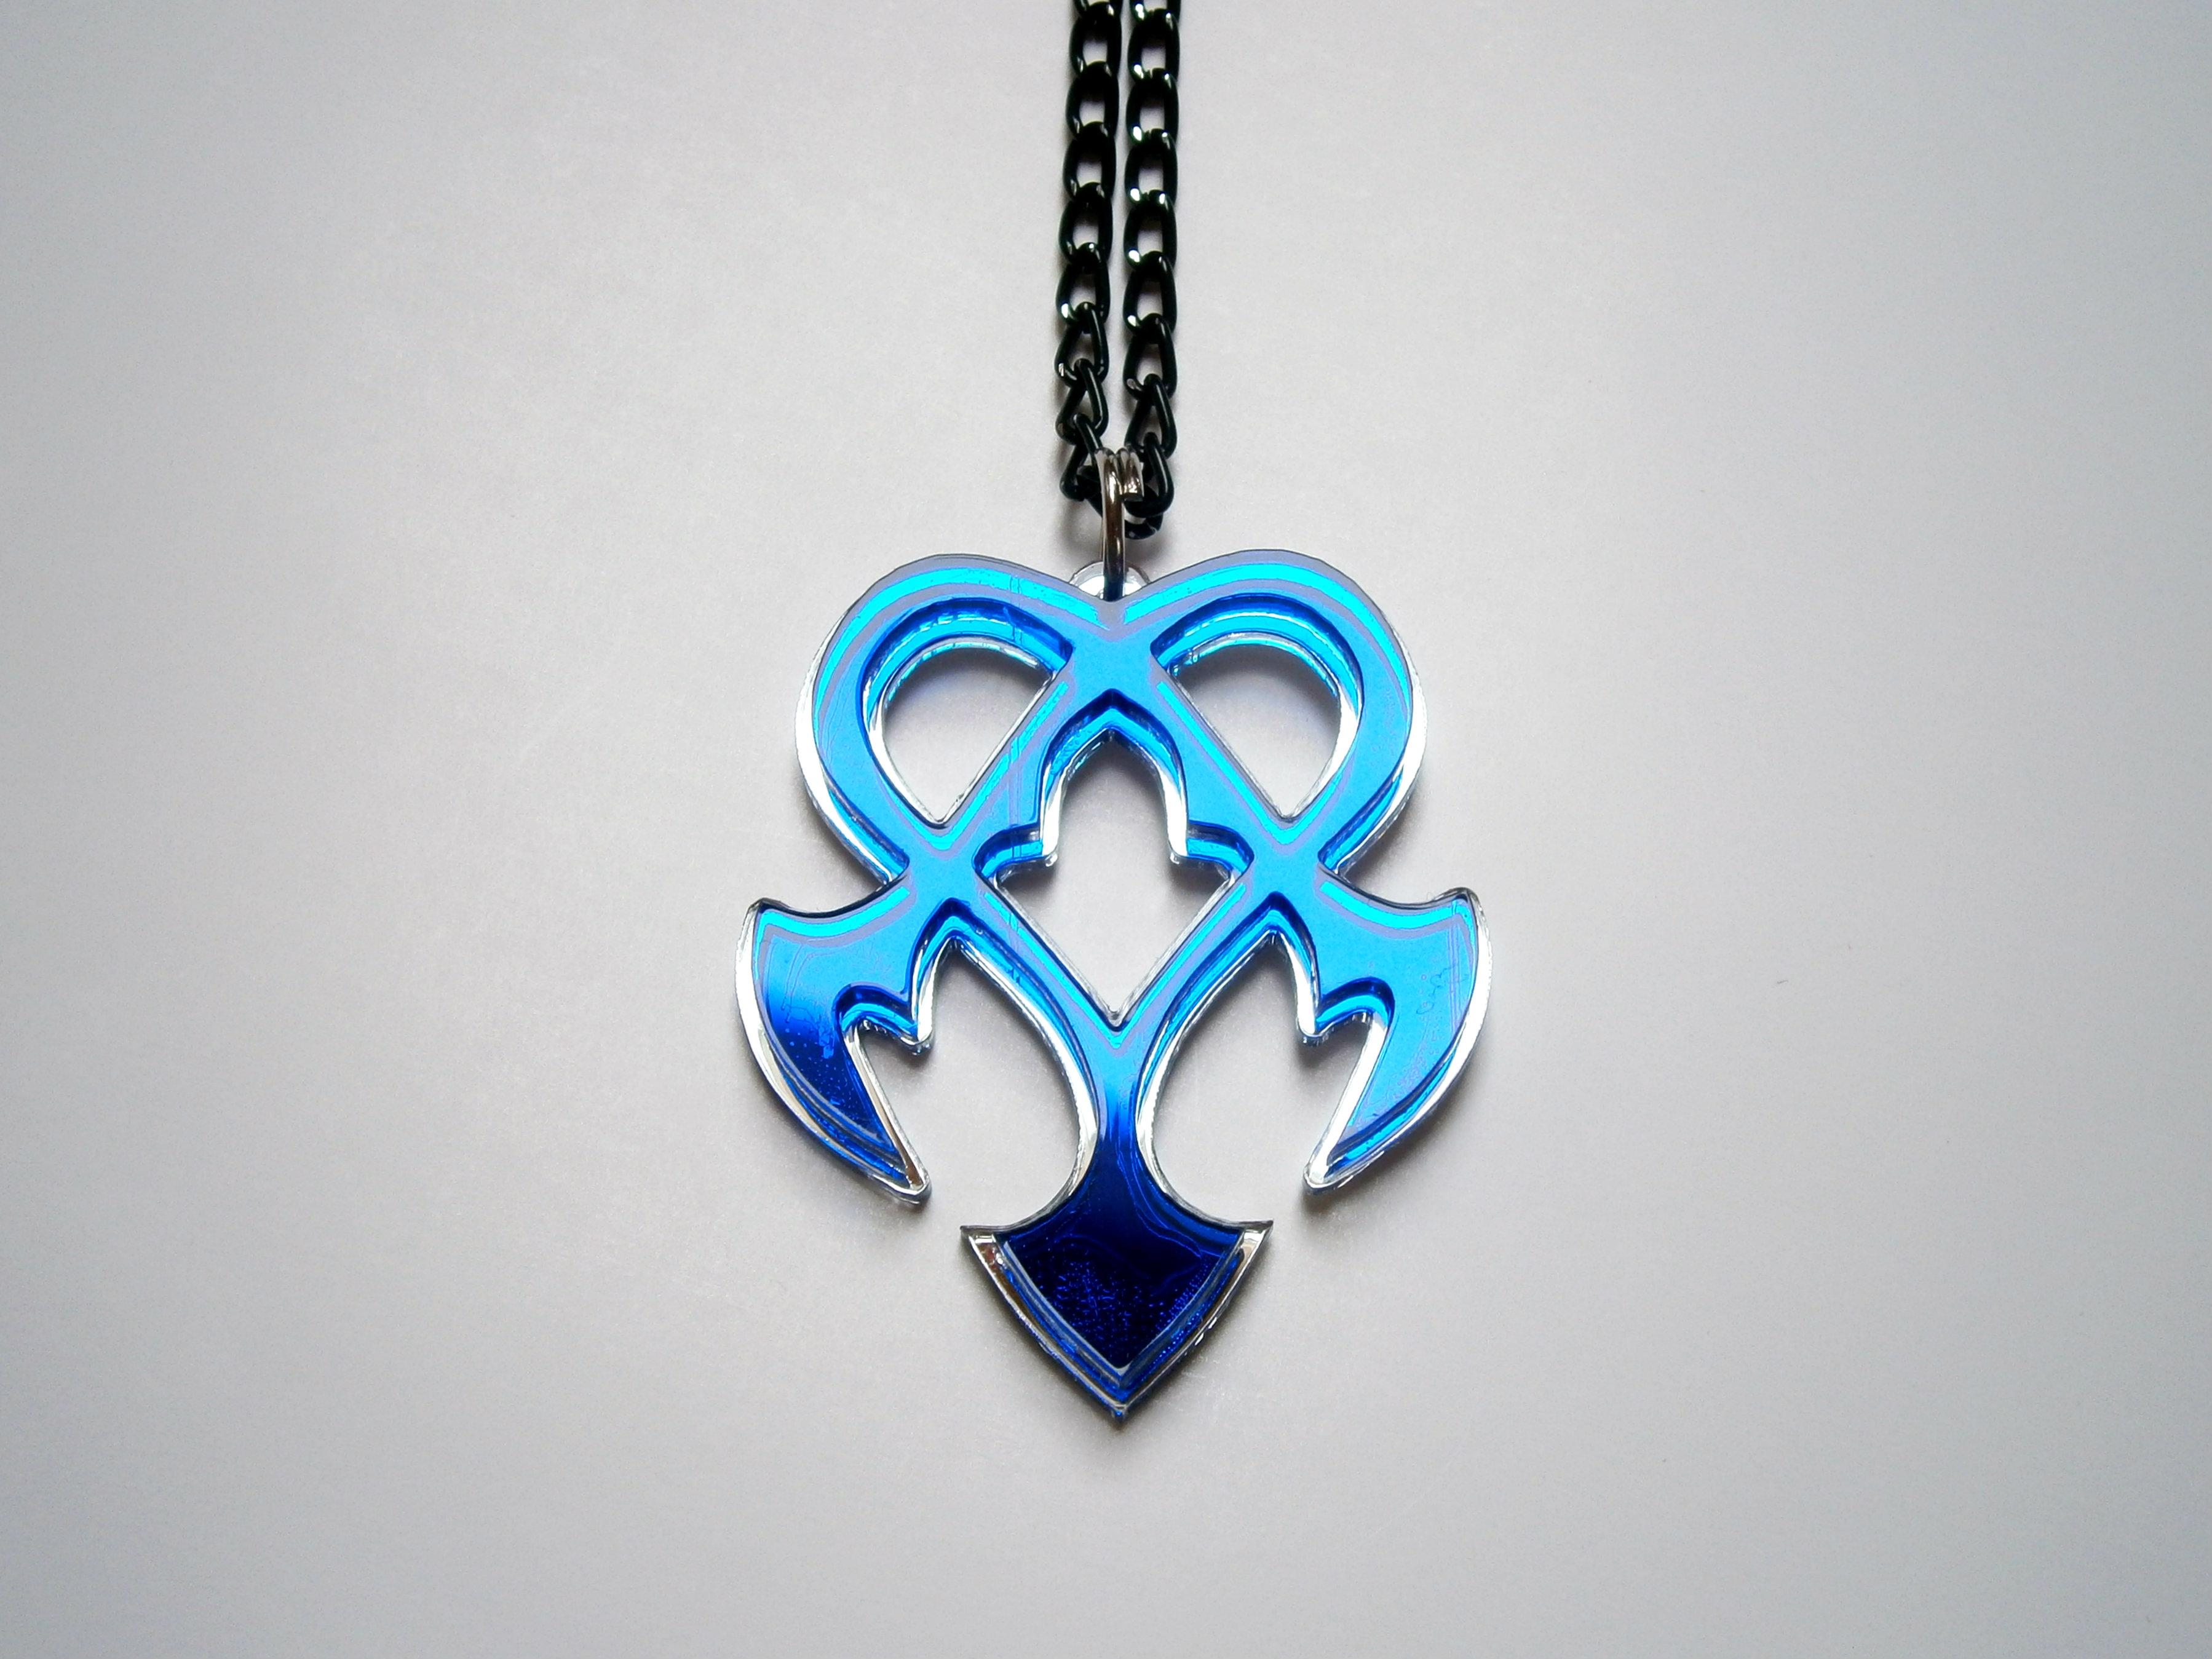 kingdom hearts nightmarependant necklace inspiring jewelry